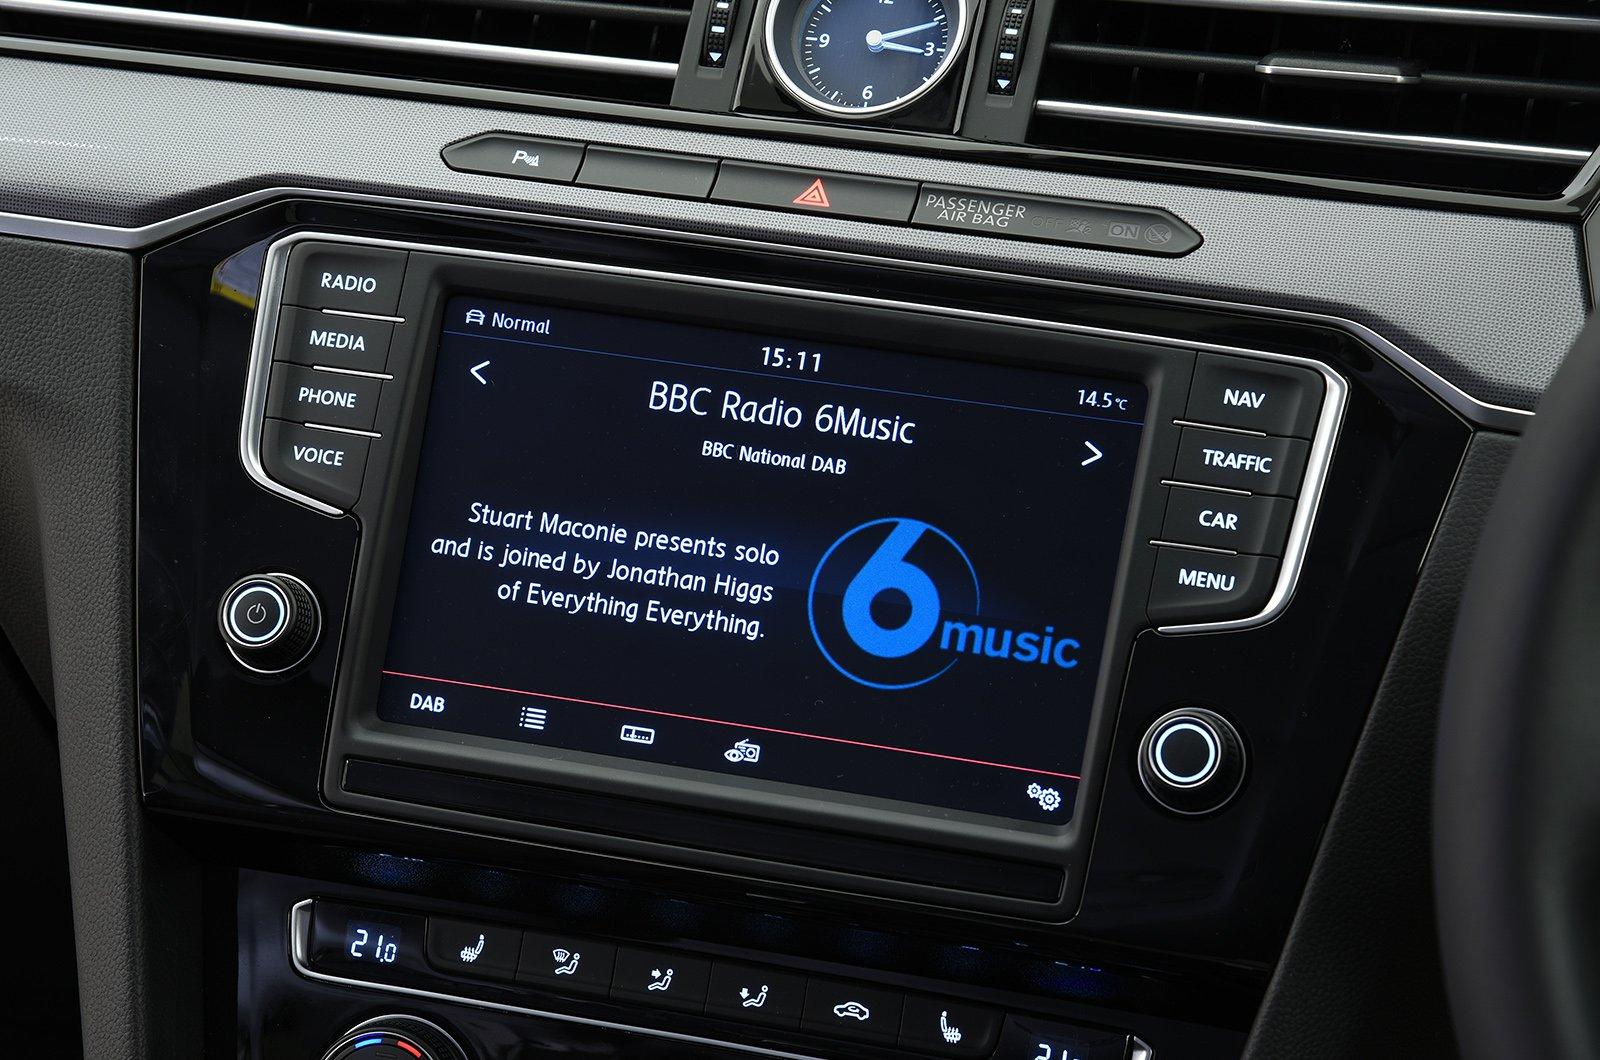 VW Passat 15-present infotainment